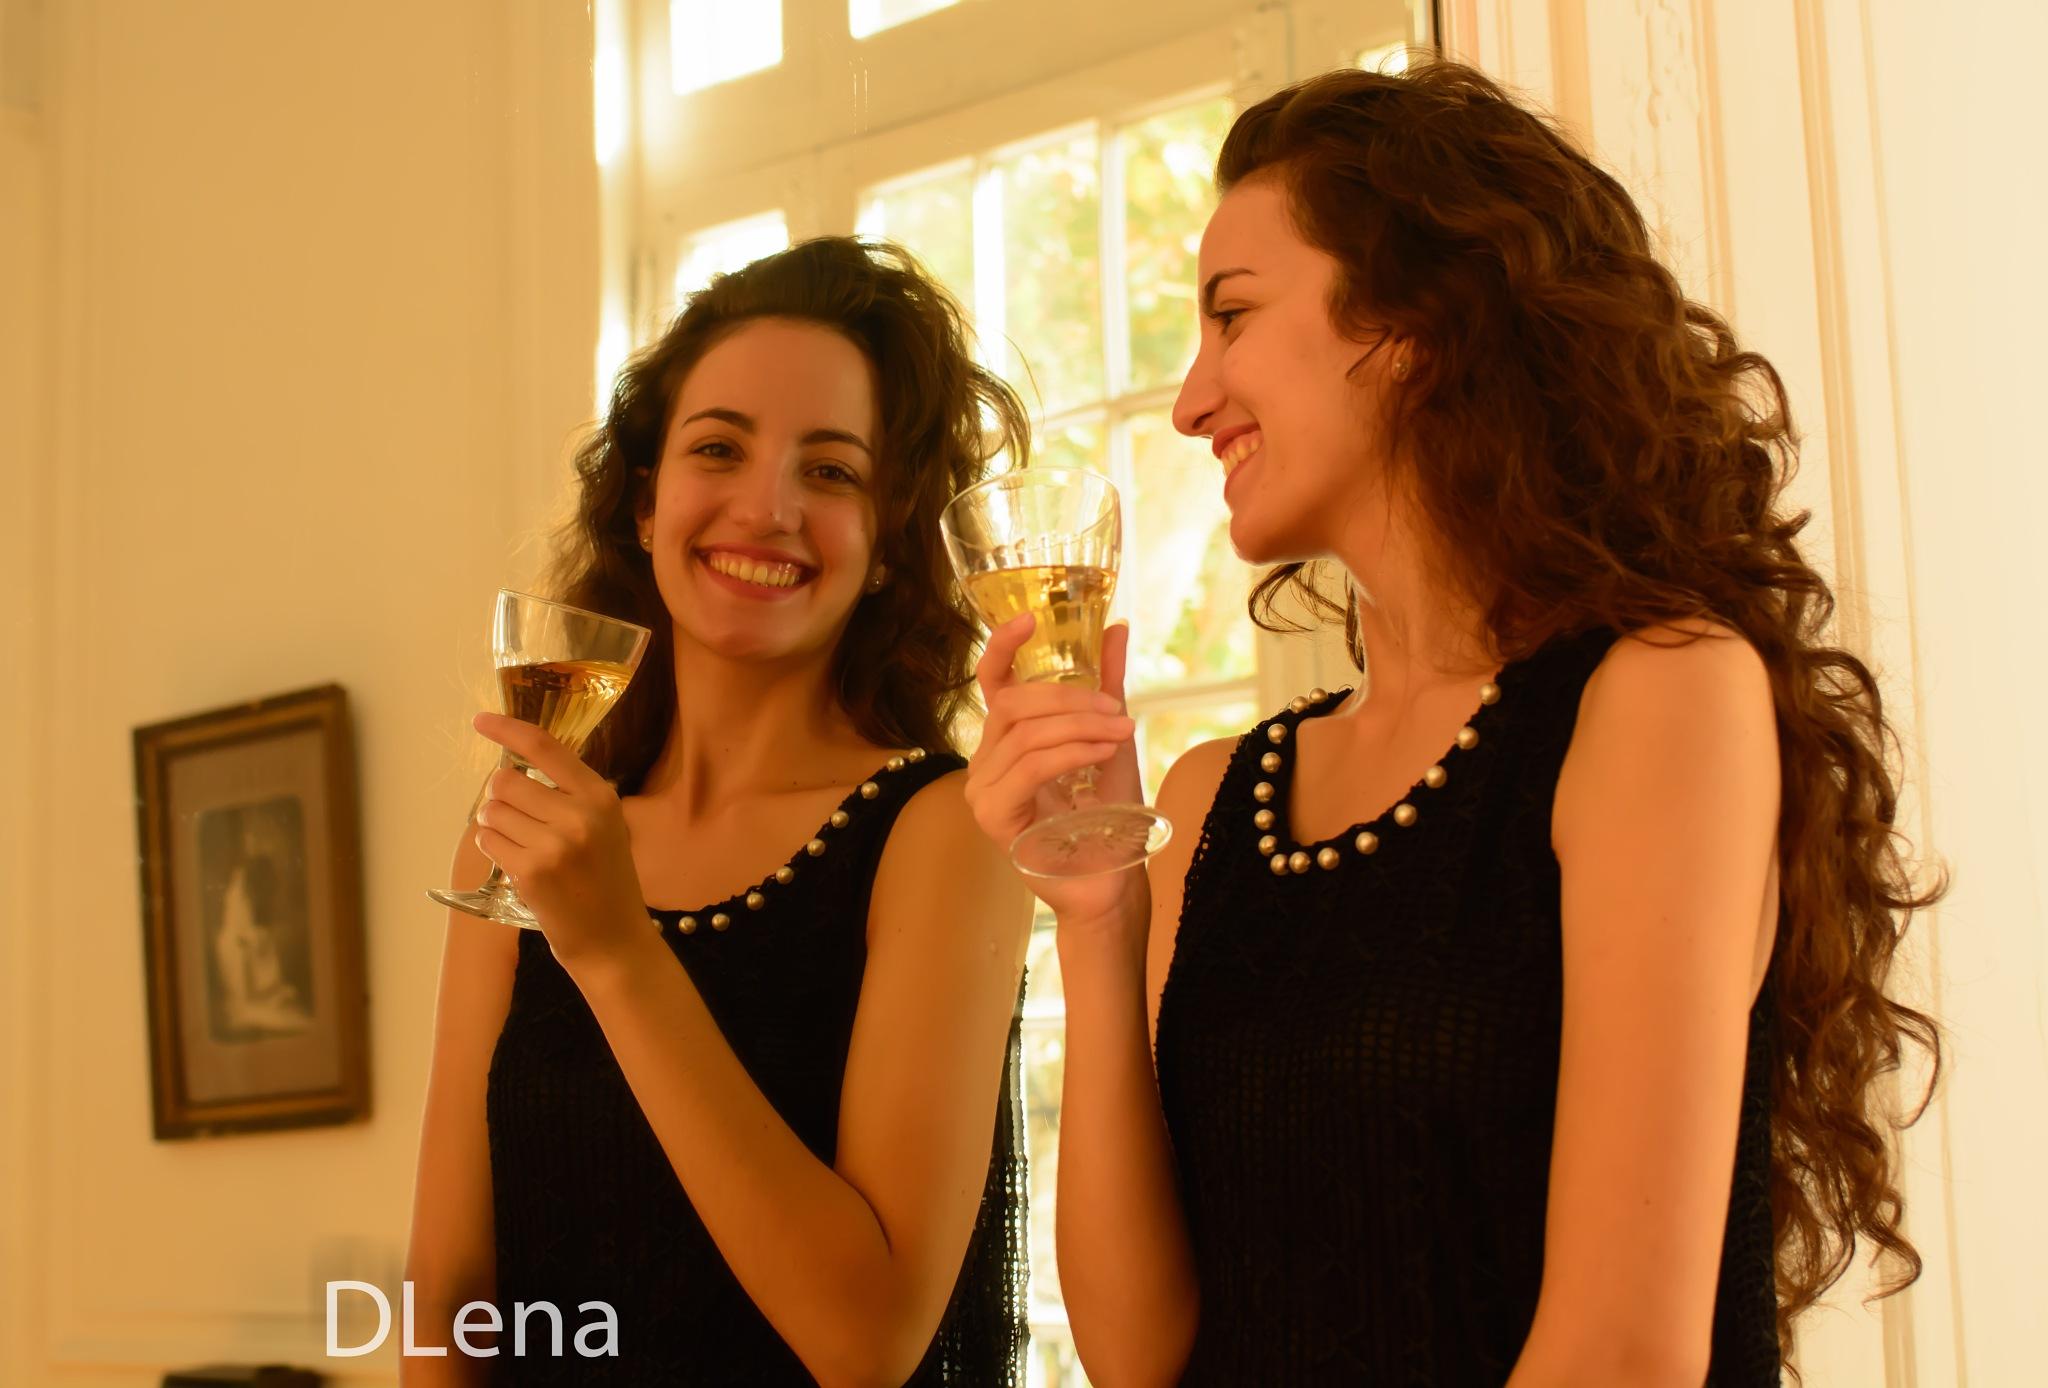 sonrisa by Diego Lena